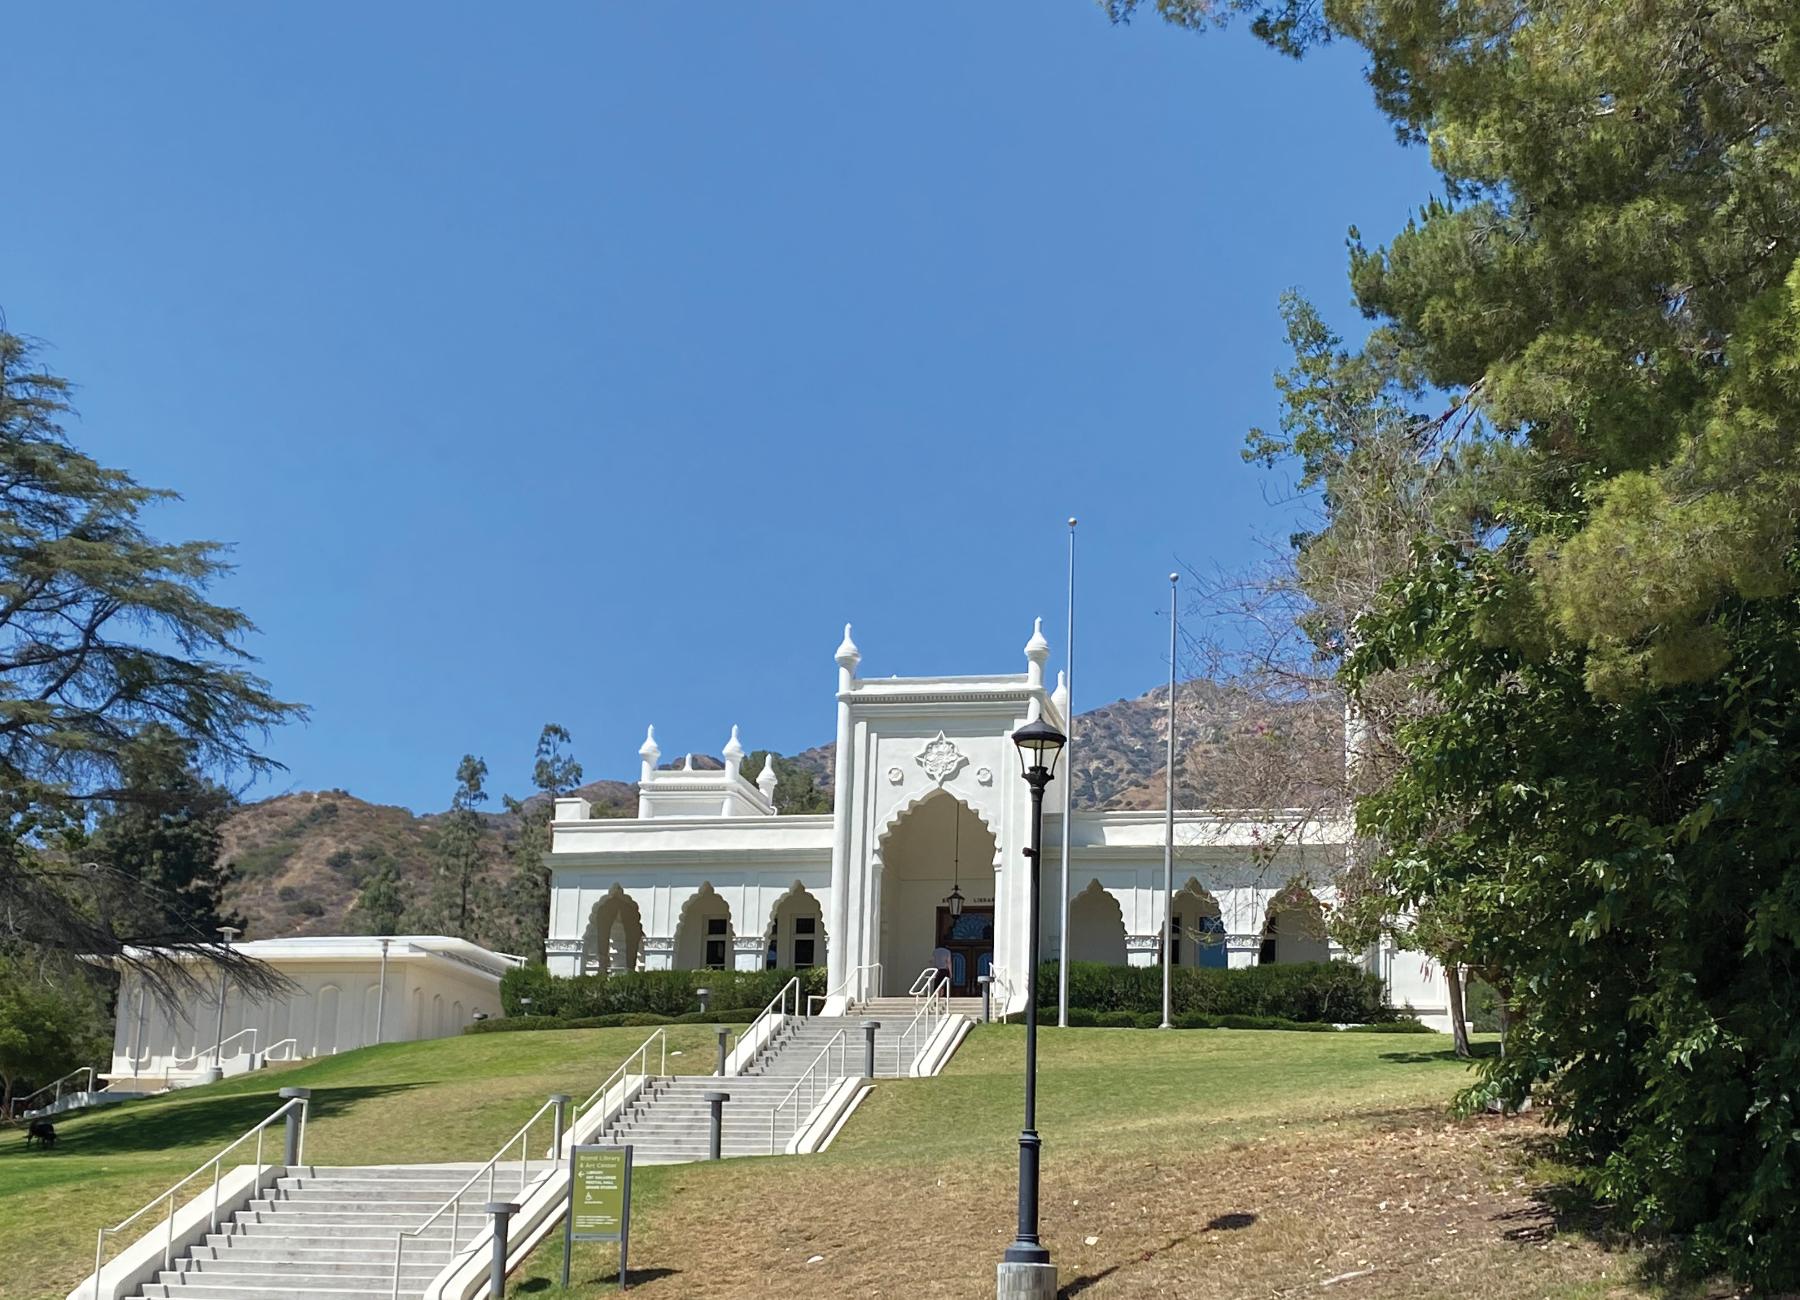 Glendale Real Estate Report